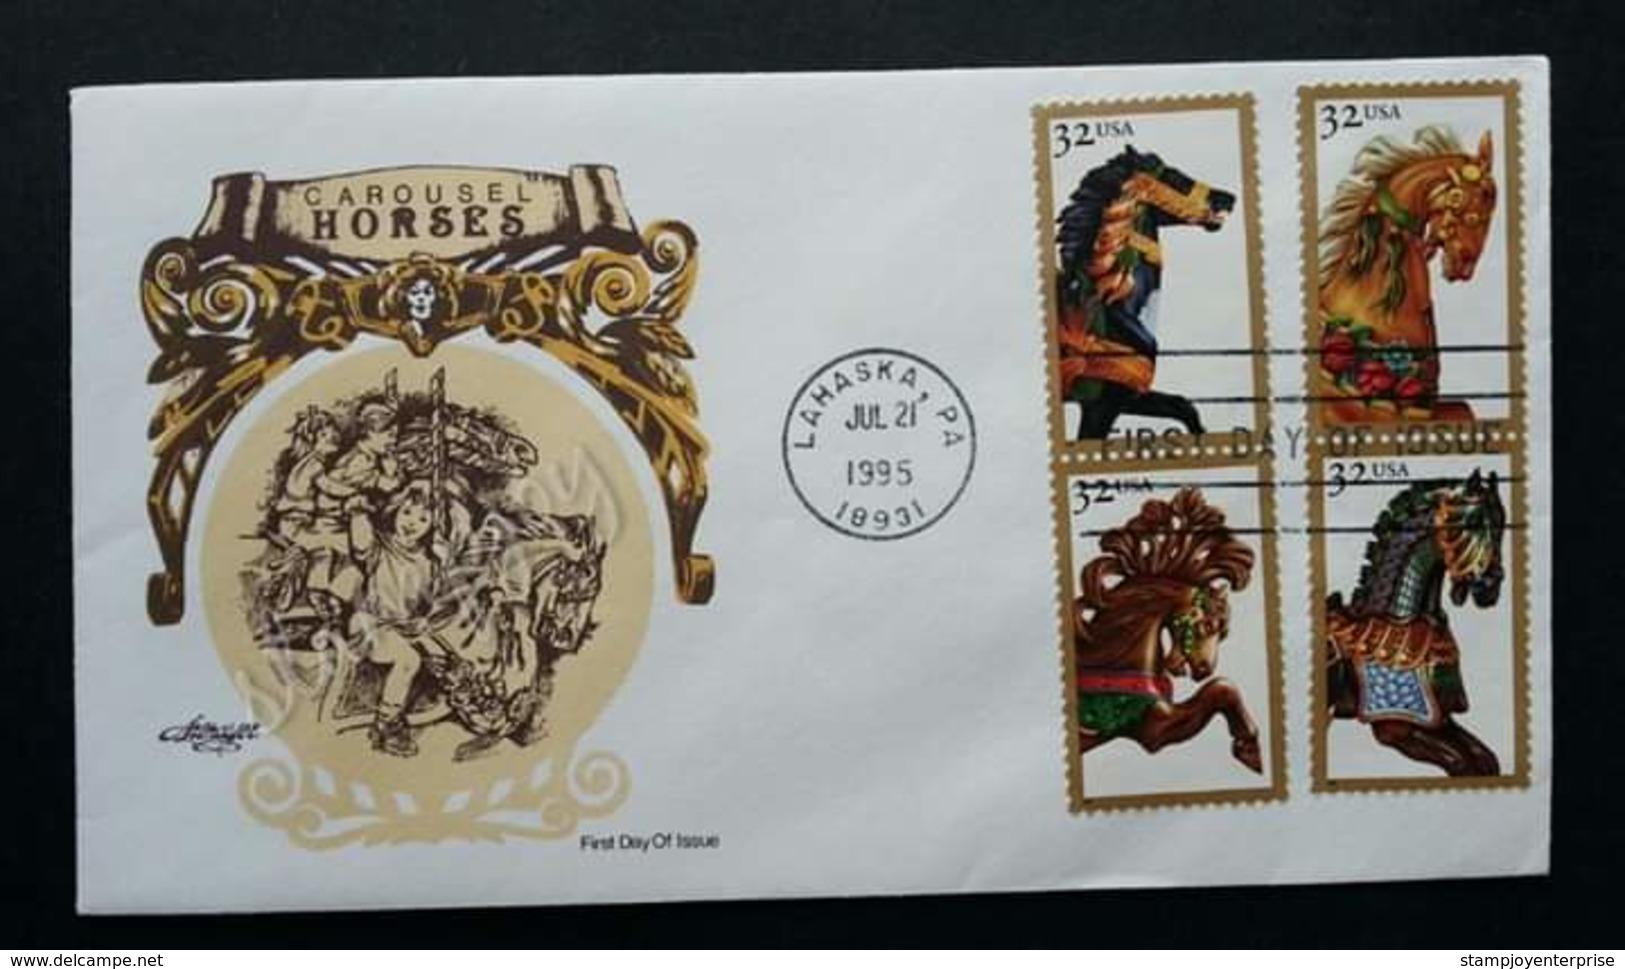 USA United States Carousel Horse 1995 (stamp FDC) - Etats-Unis